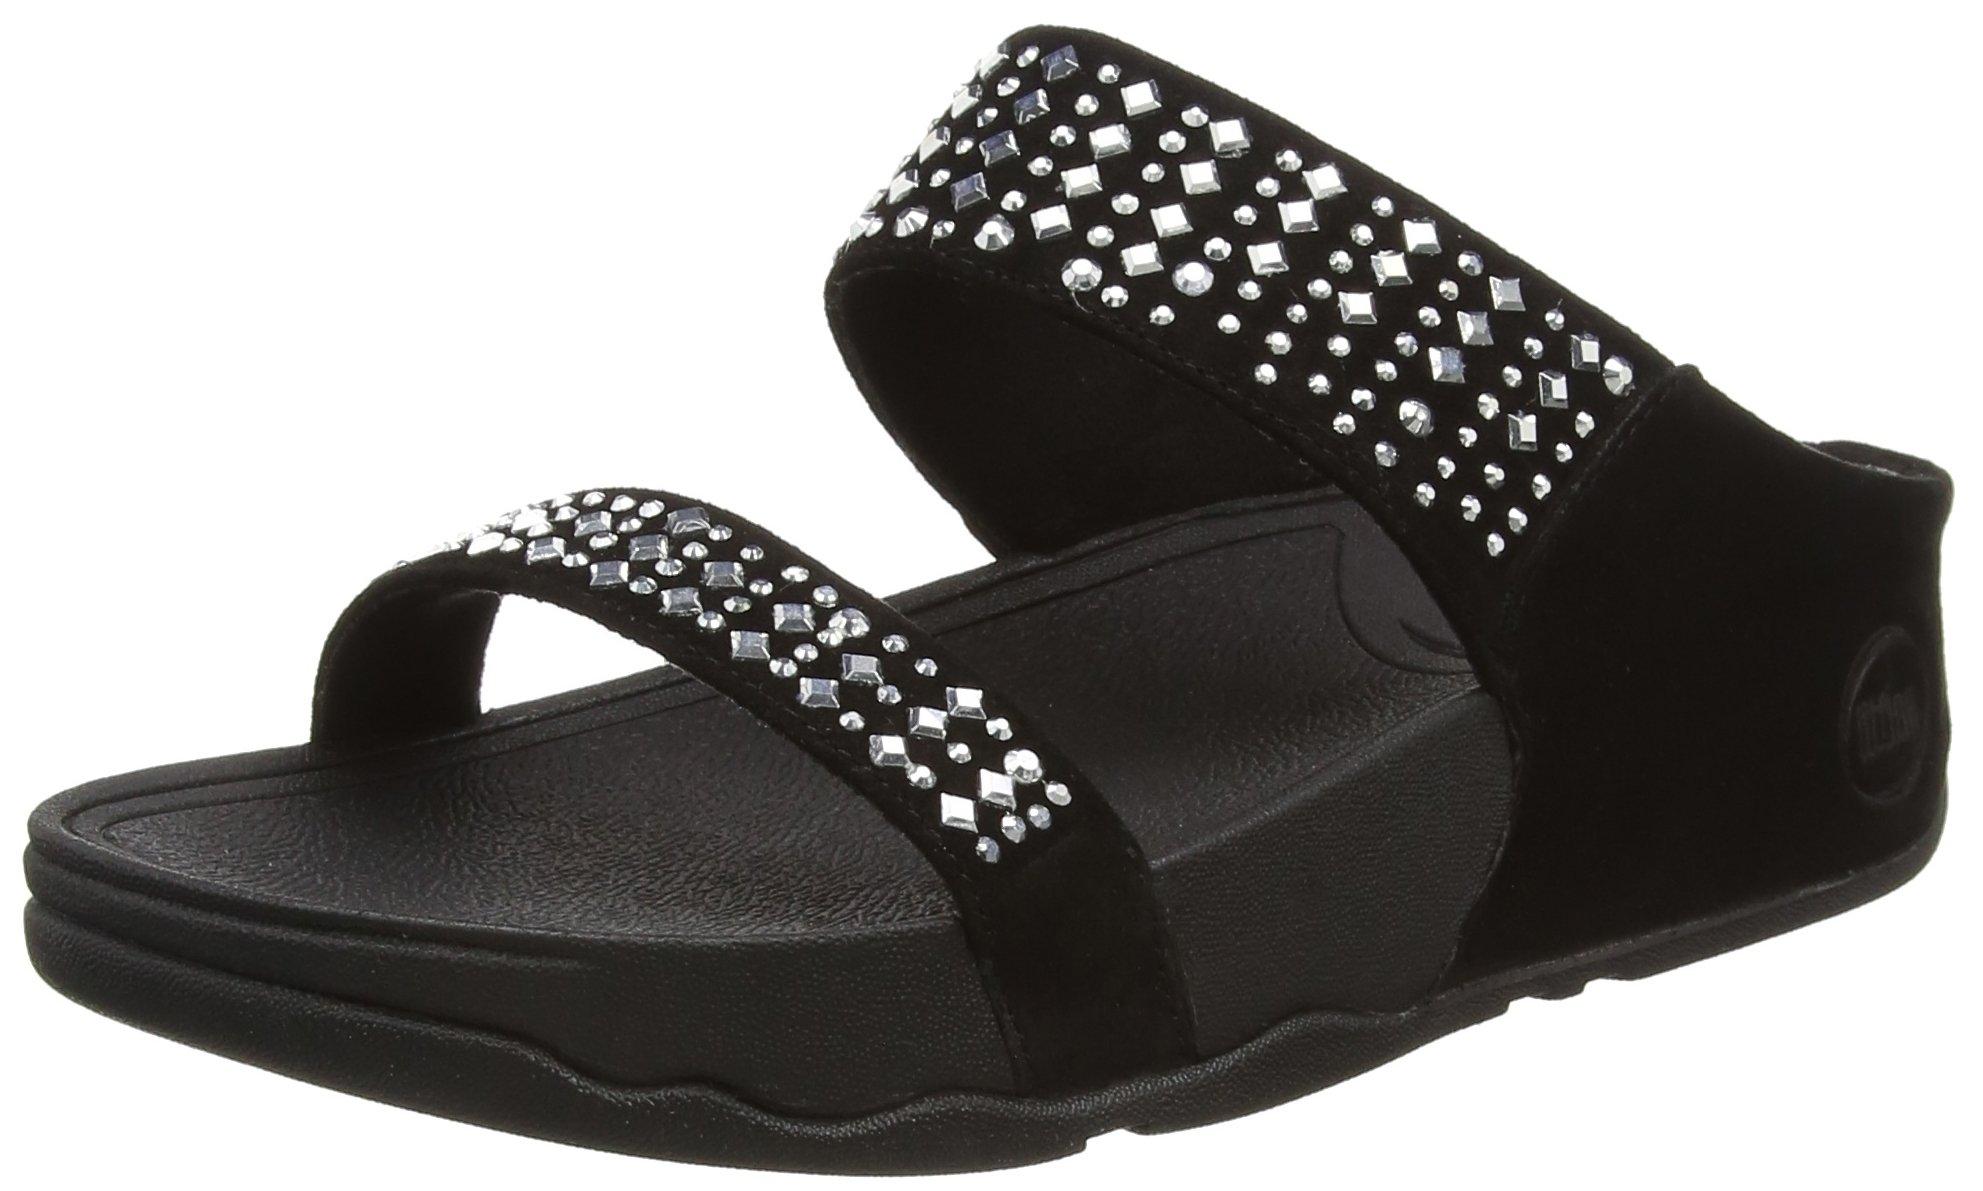 FitFlop Women's Novy Slide Sandal, black, 8 M US